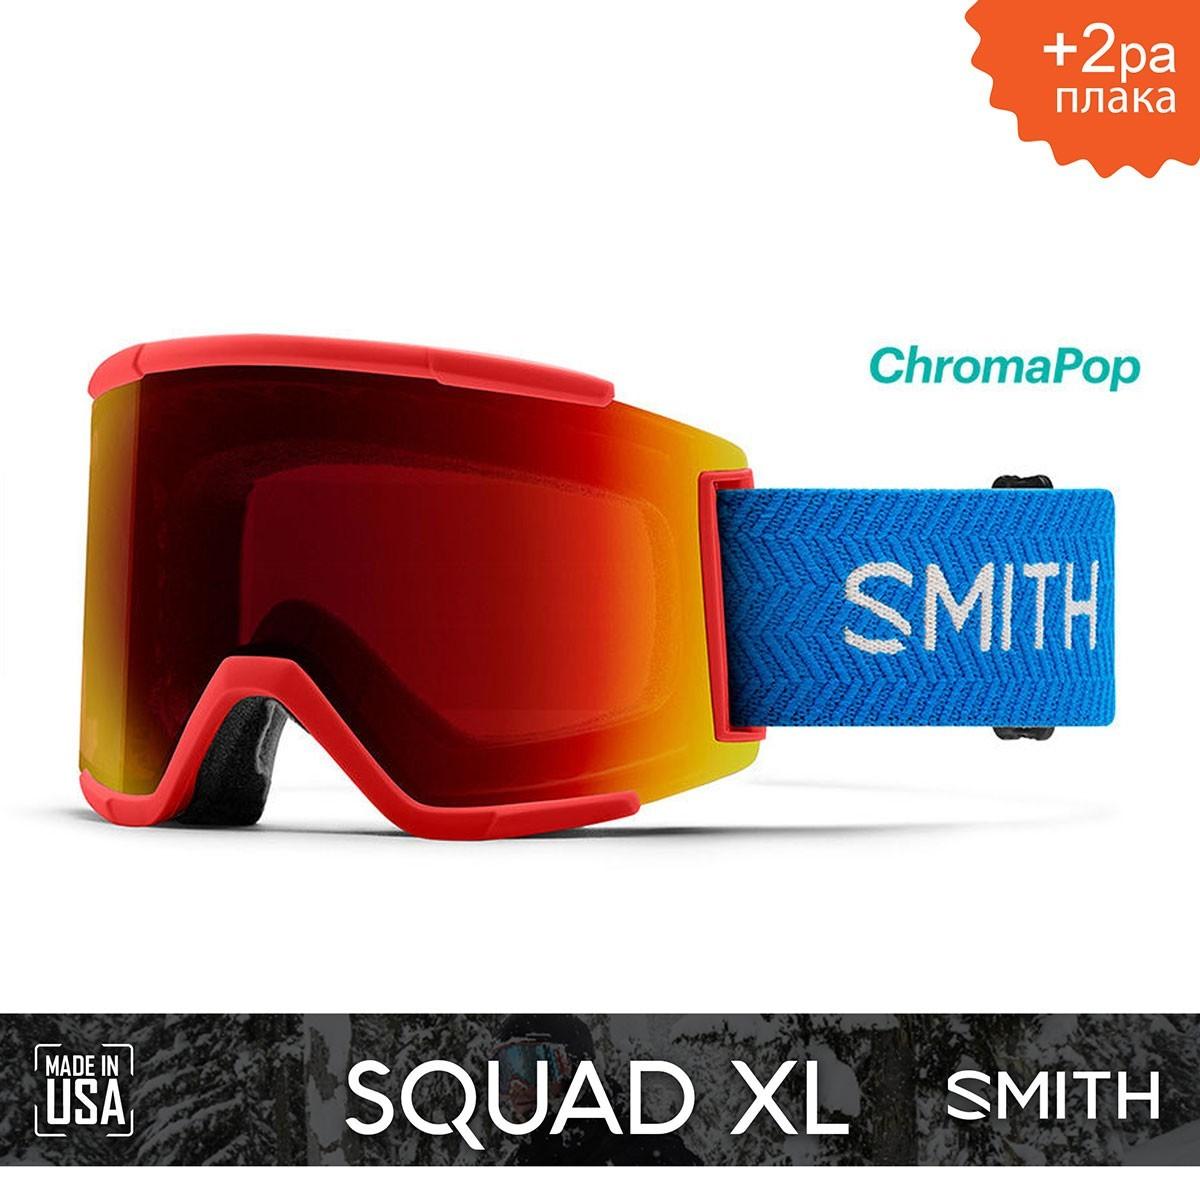 SMITH SQUAD XL Rise Block | S3 CHROMAPOP Sun Red Mirror - Изображение - AQUAMATRIX